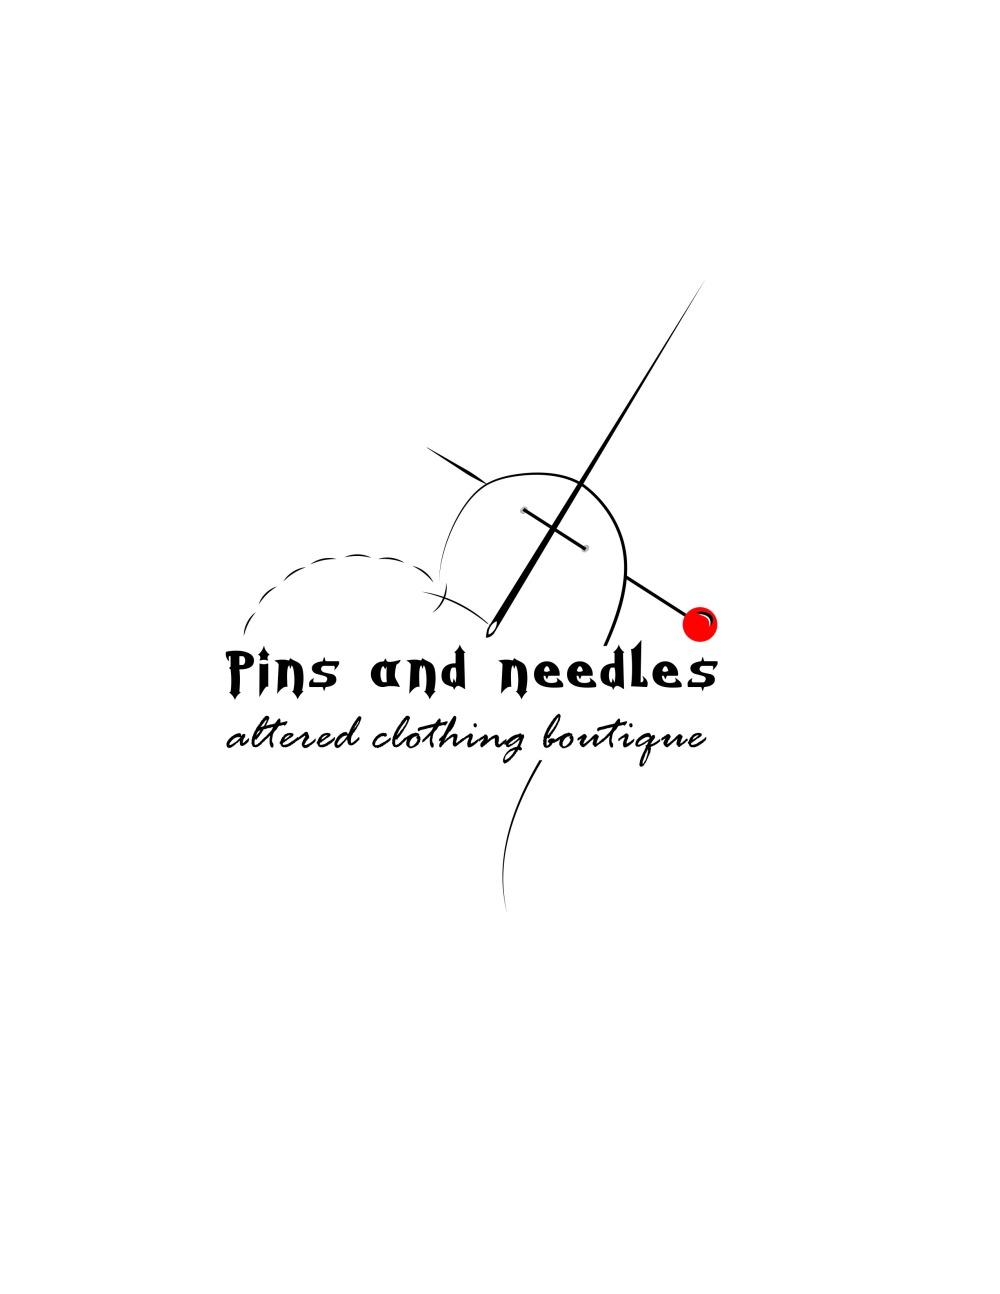 pins_and_needles2